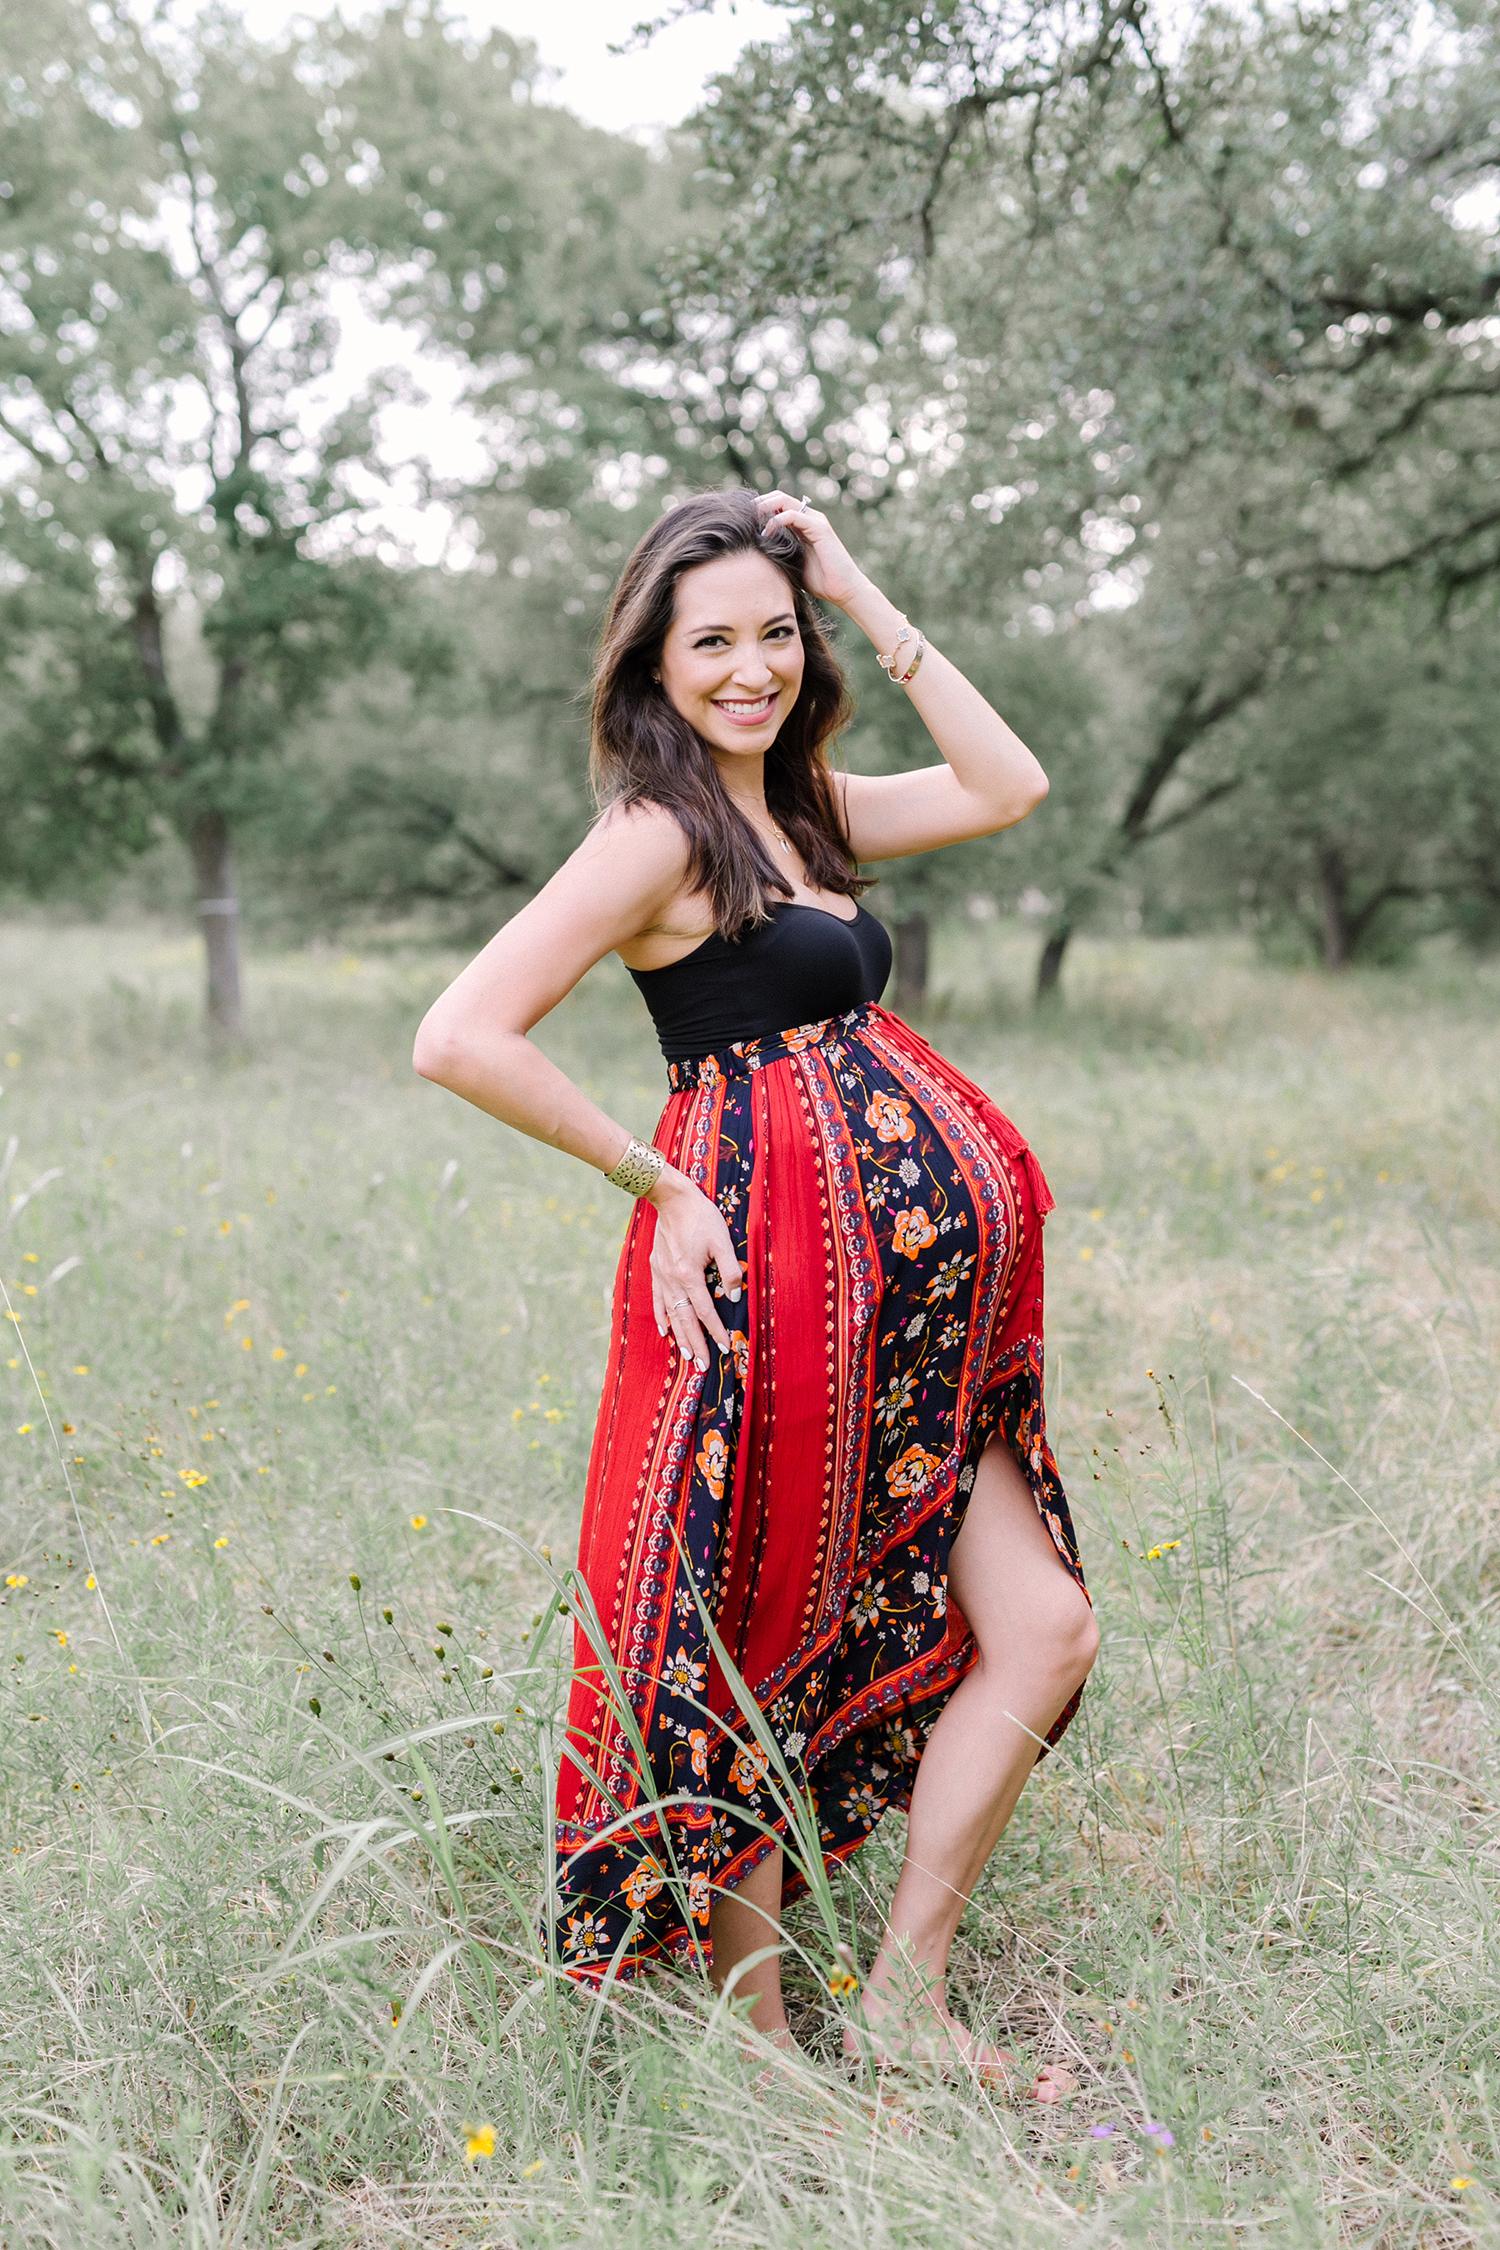 austin-atx-maternity-pregnancy-photographer-kbp-31.jpg